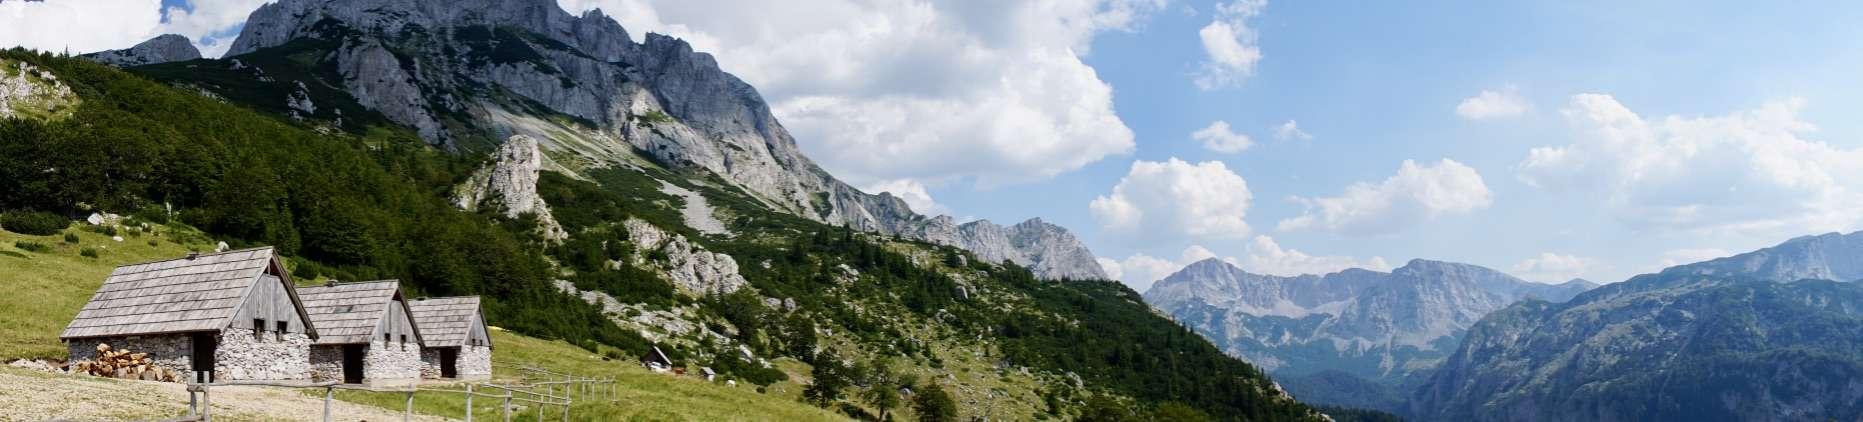 Prijevor Huts Via Dinarica Trail Itinerary